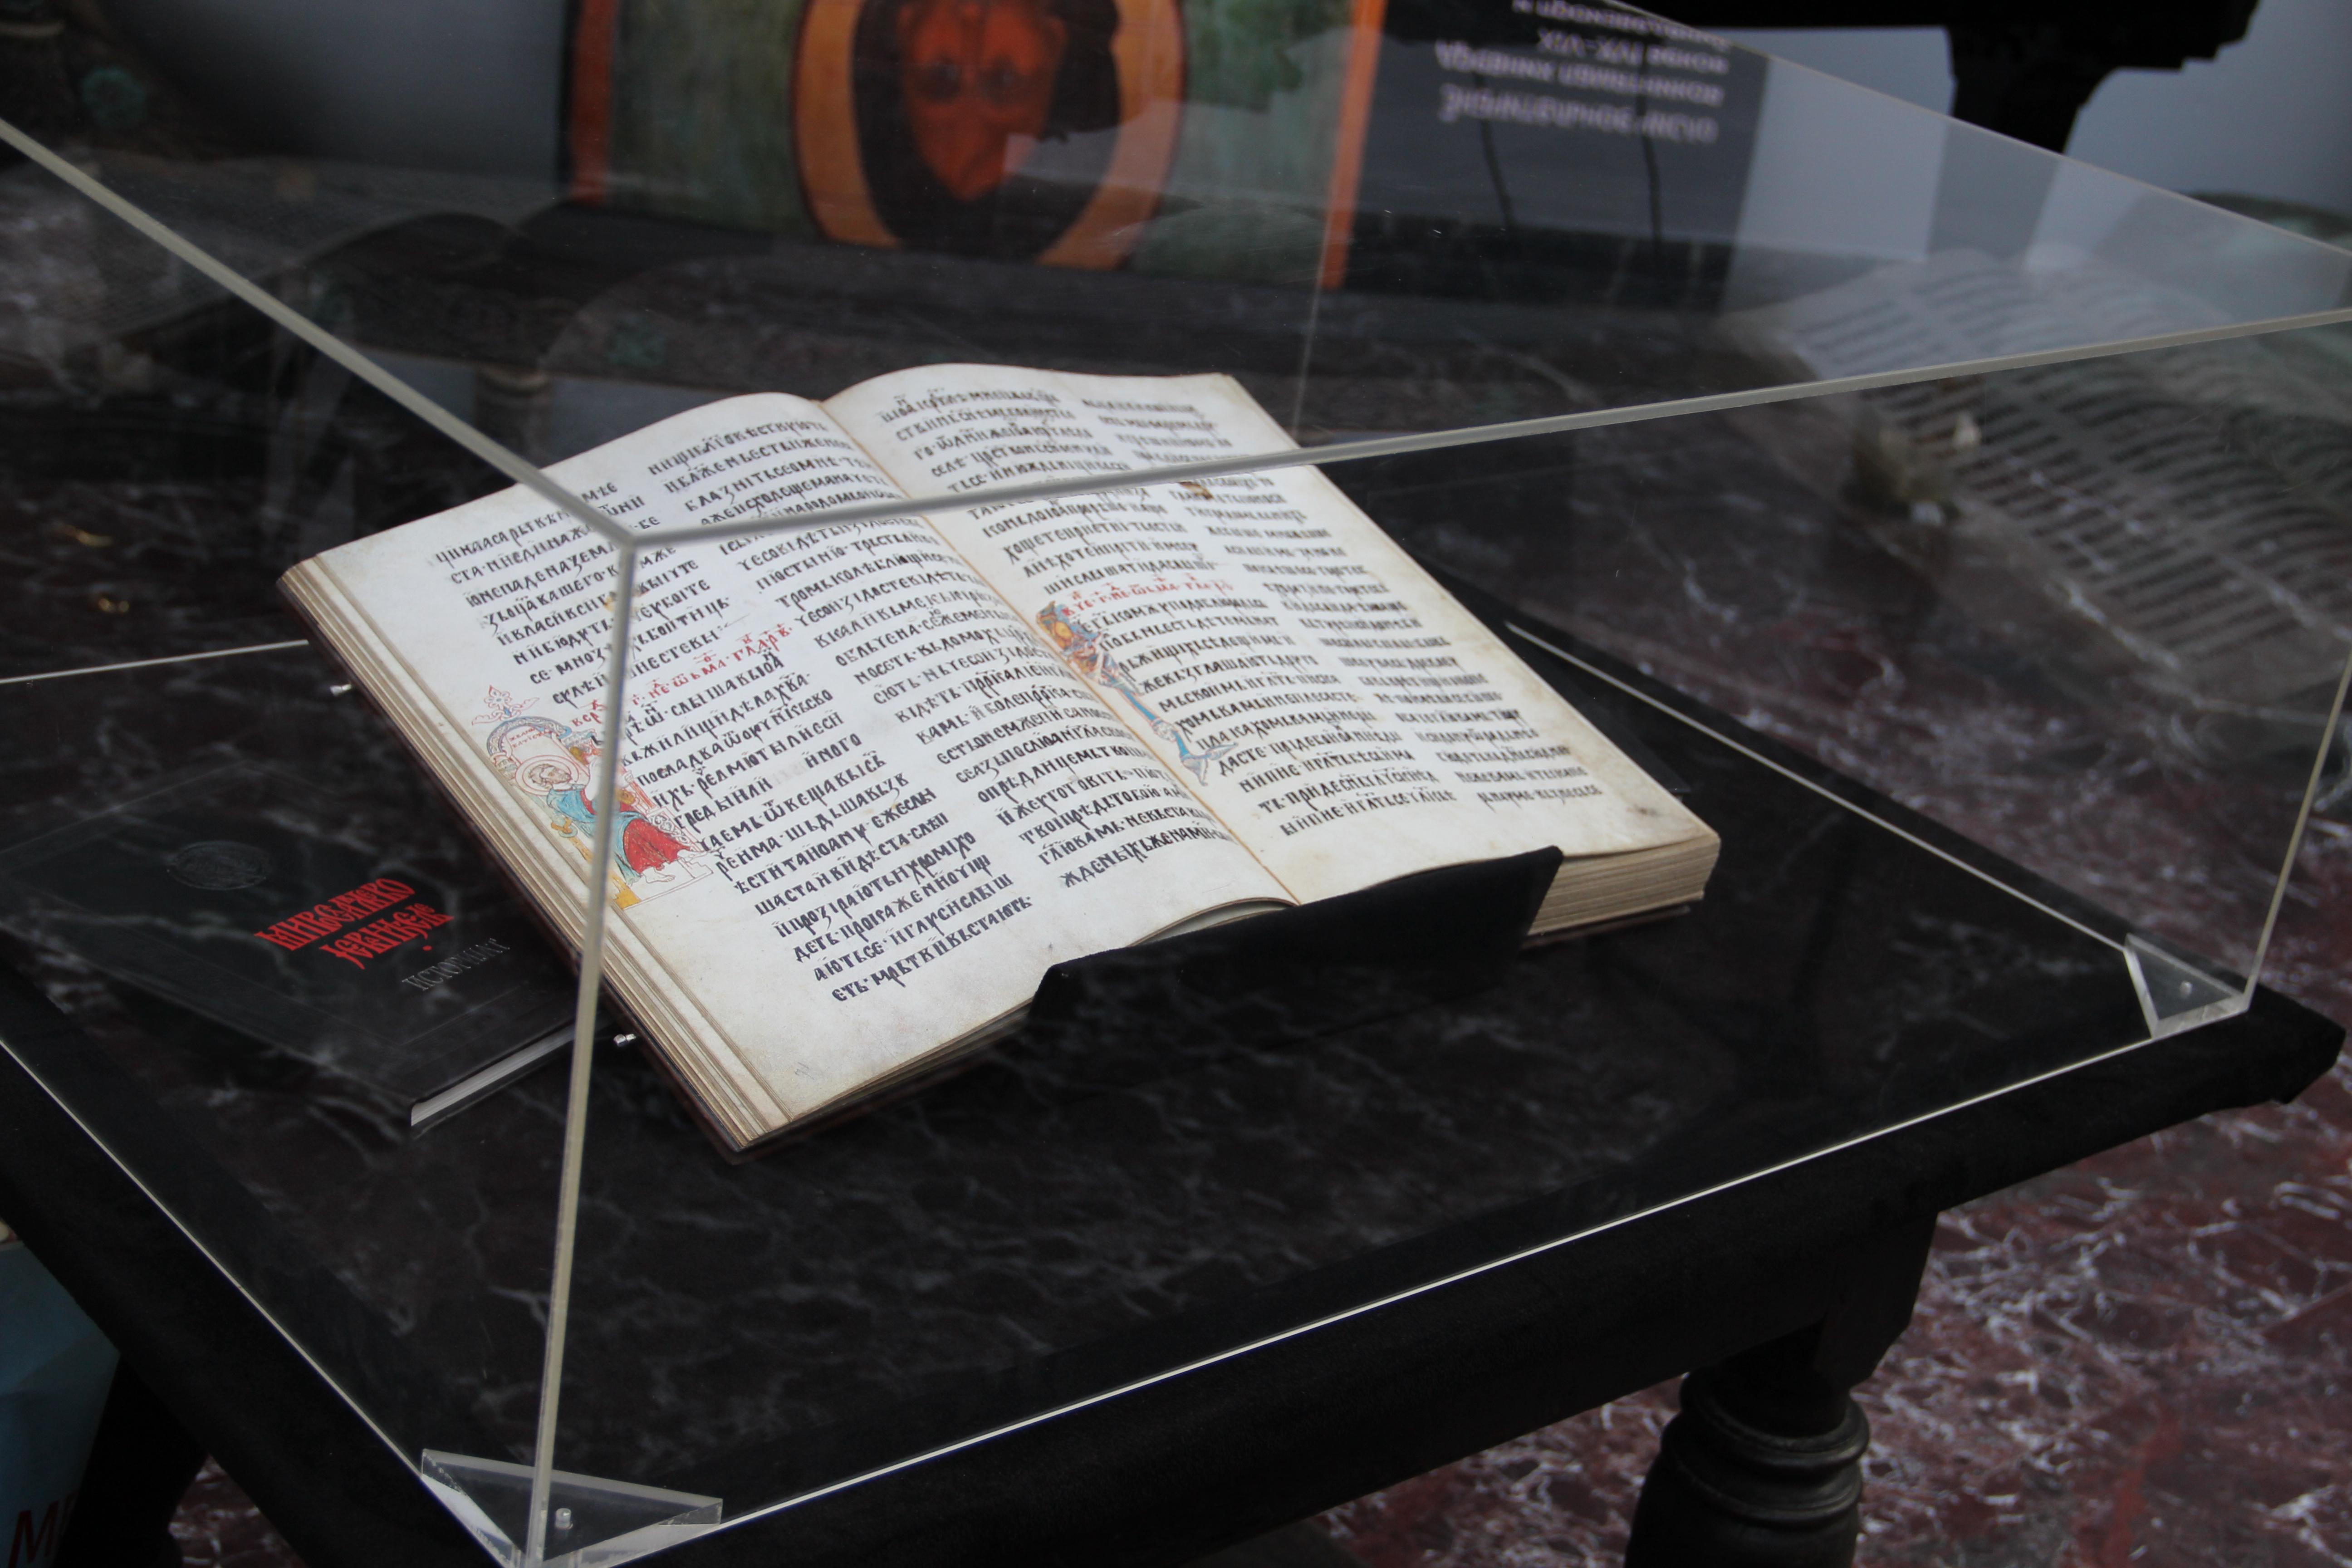 Najznačajniji čirilični spomenik: Predstavljeno faksimilno izdanje Miroslavljevog jevanđelja